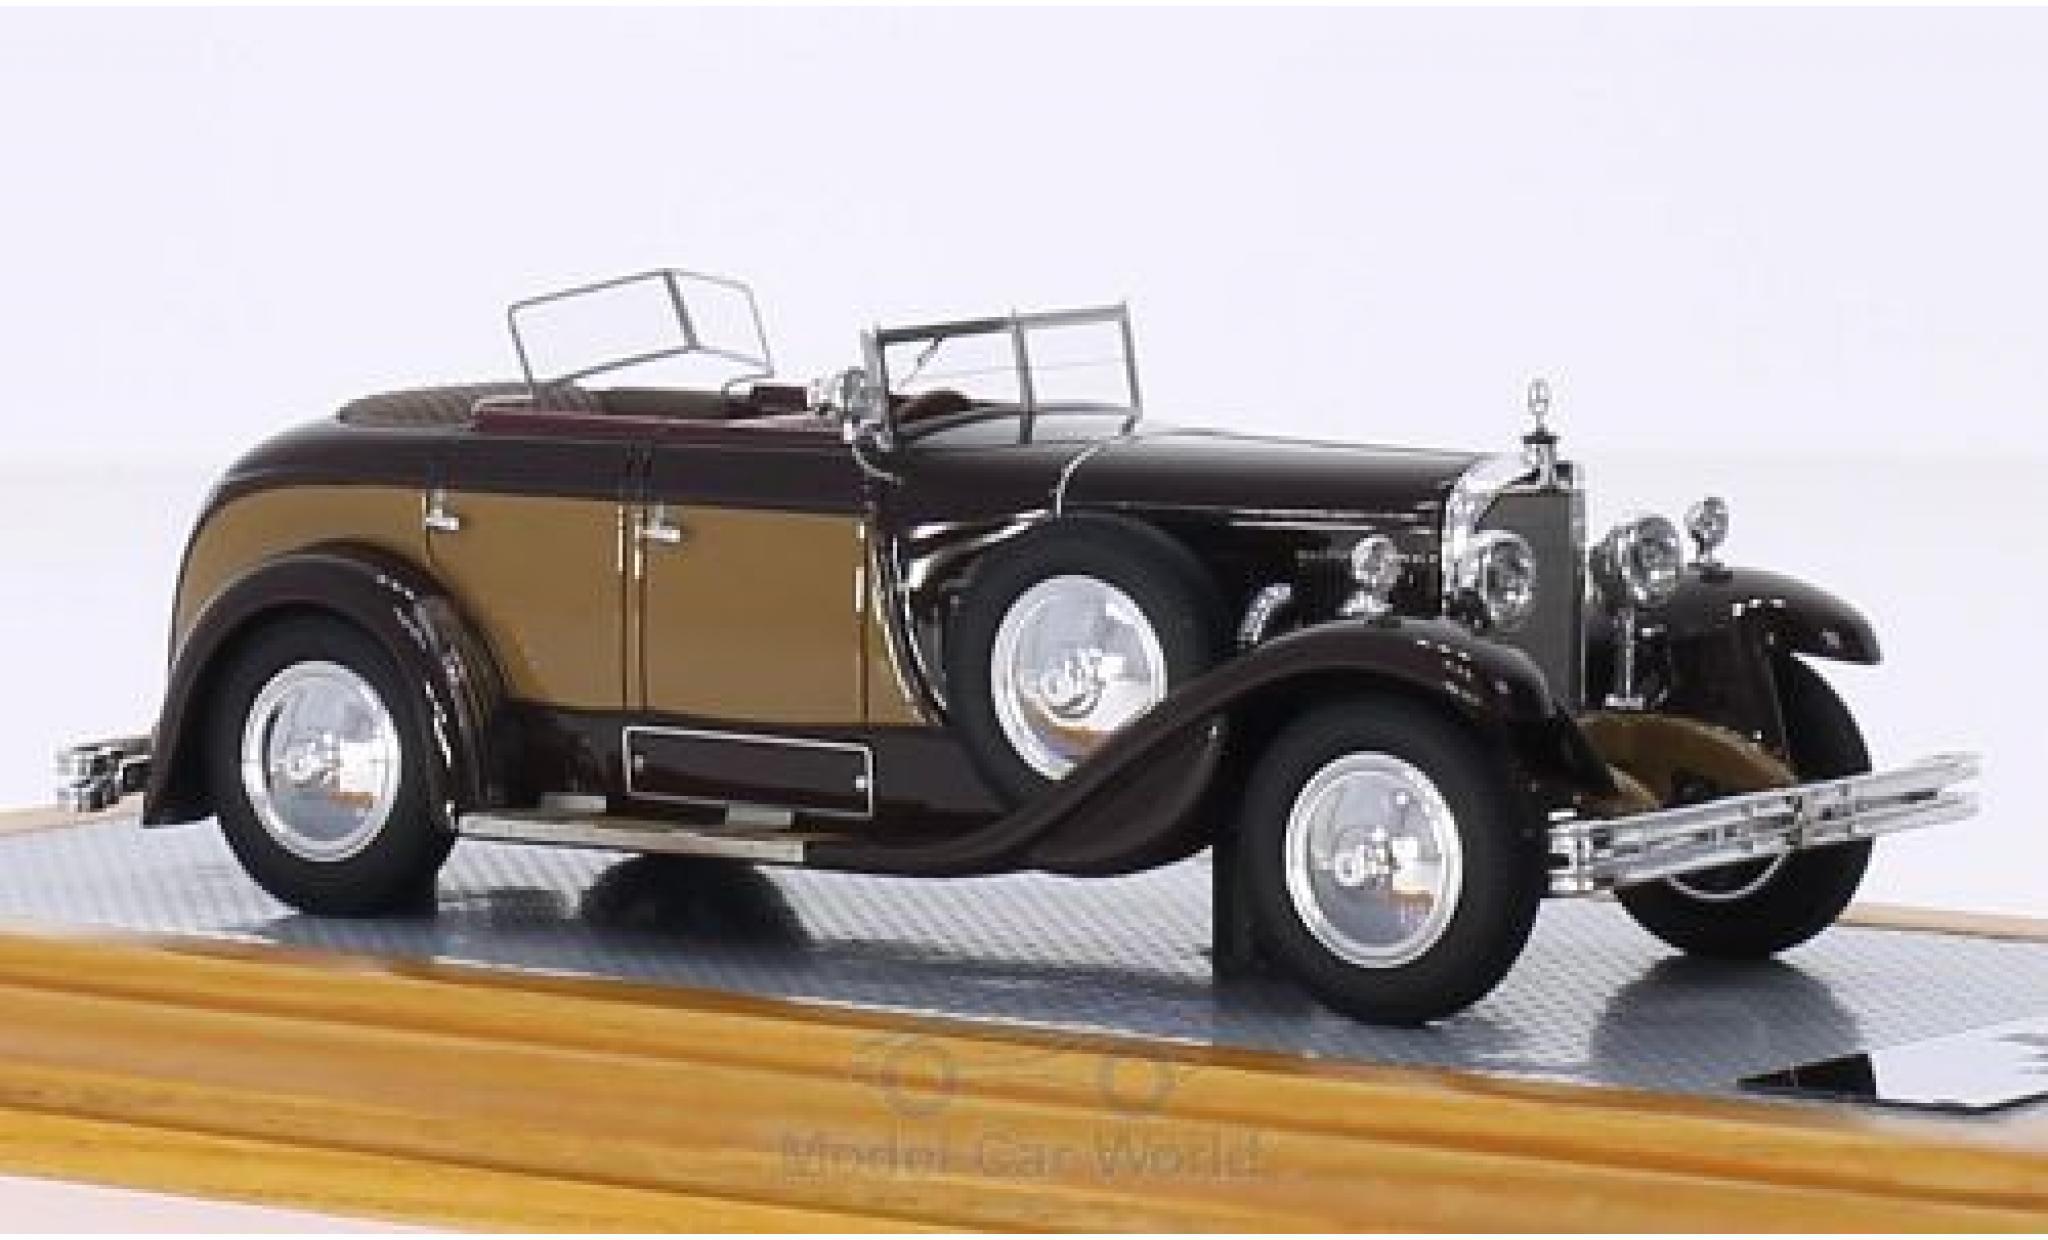 Mercedes Classe S 1/43 Ilario 630K Saoutchik Torpedo Transformable marron/marron RHD 1928